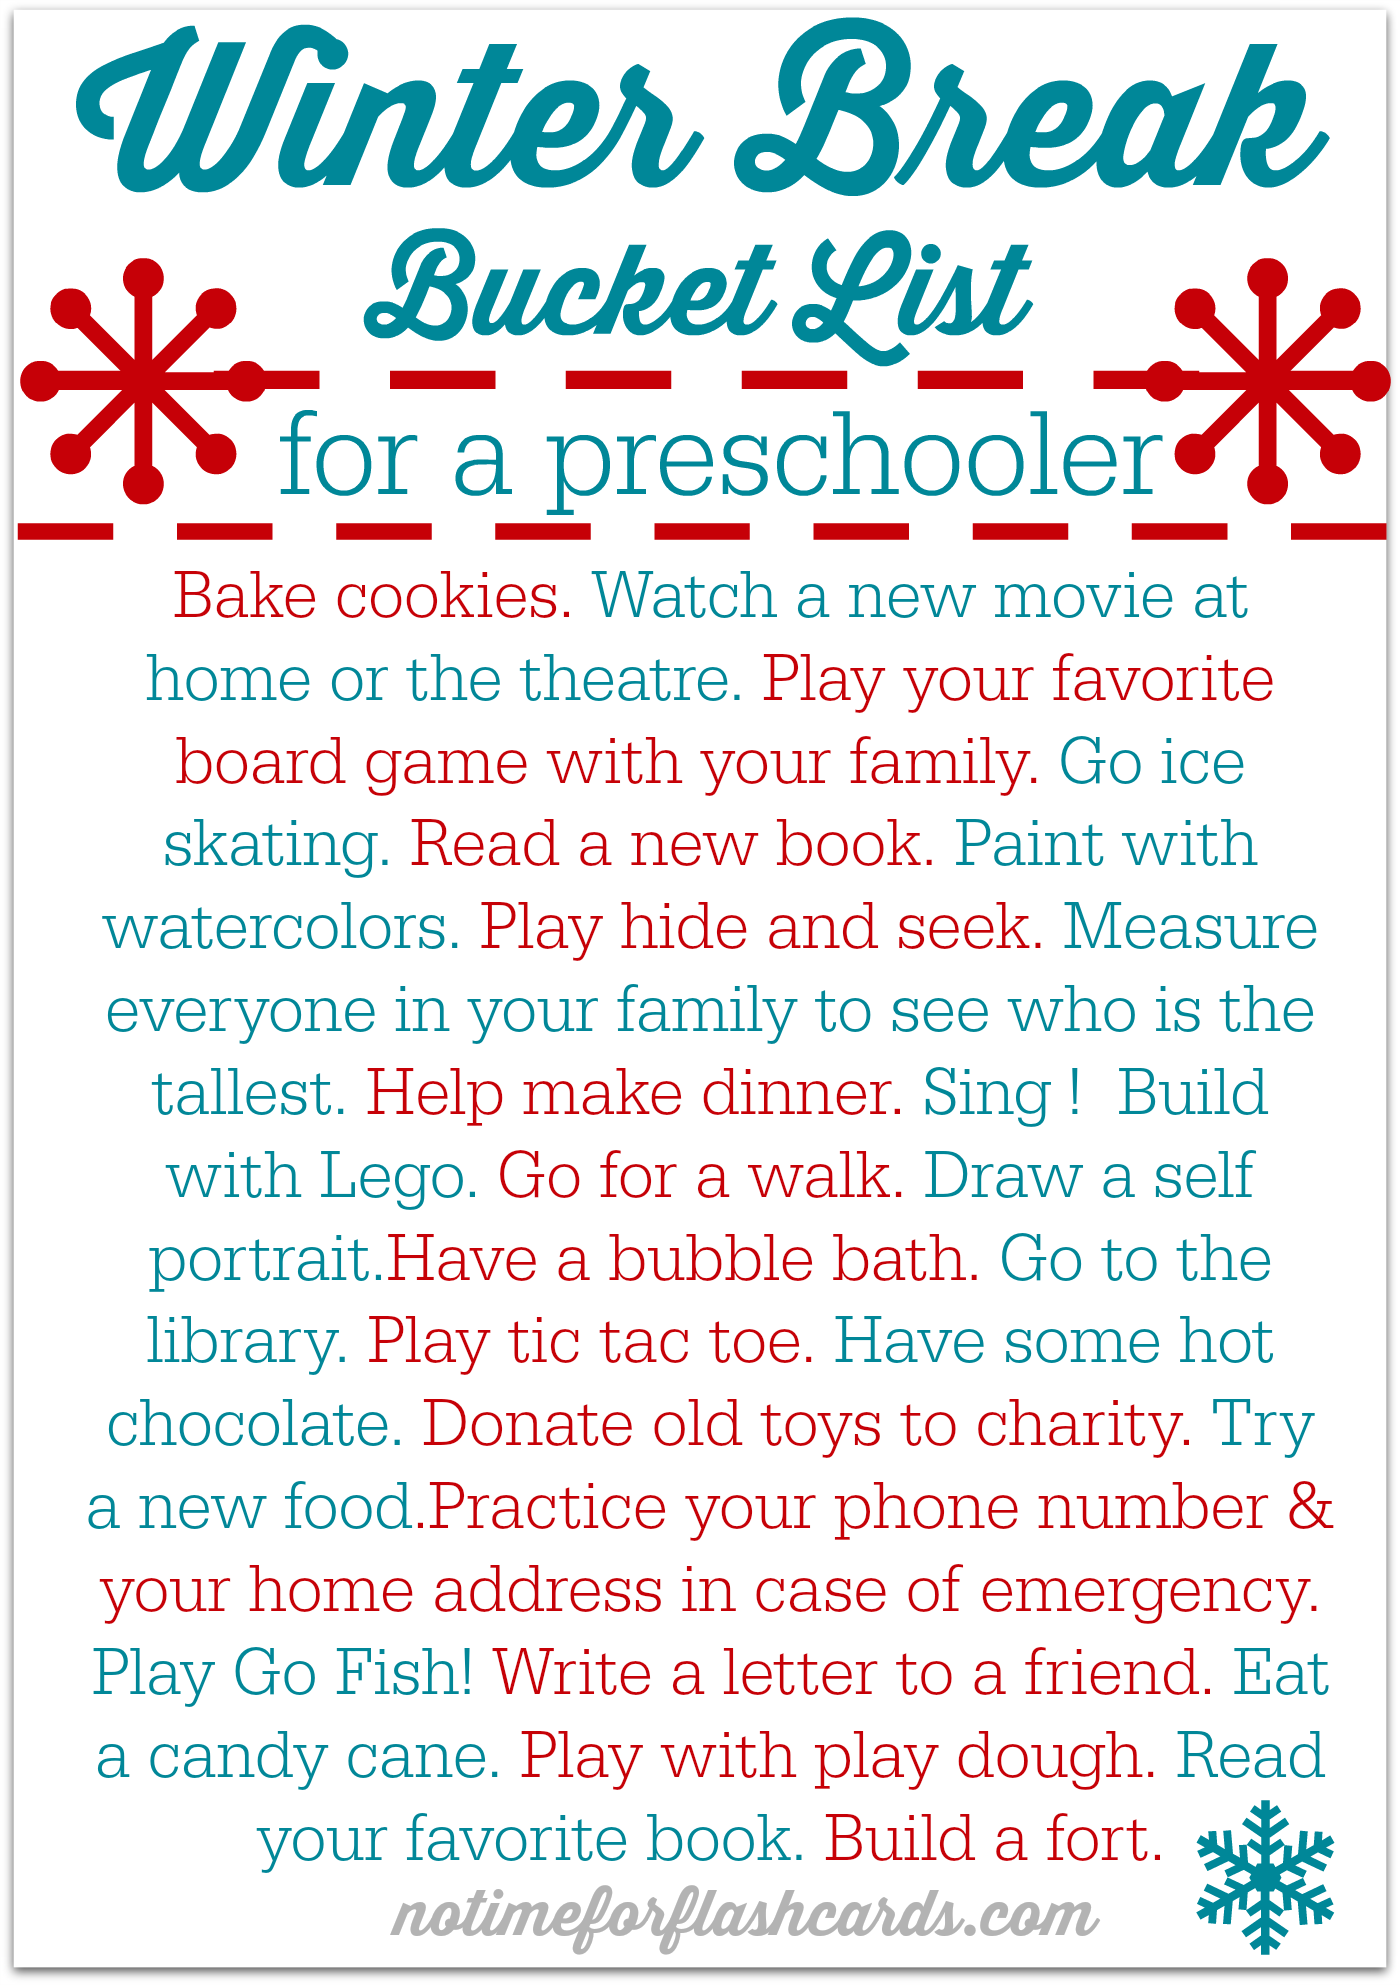 FREE Printable Winter Break Bucket List For Preschoolers